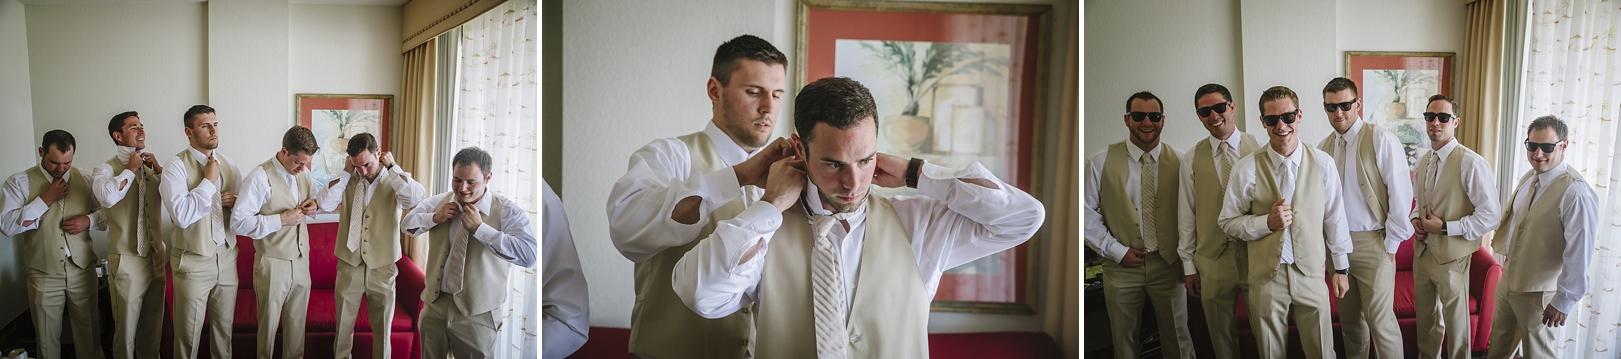 groomsmen getting ready at the sirata with wayfarers